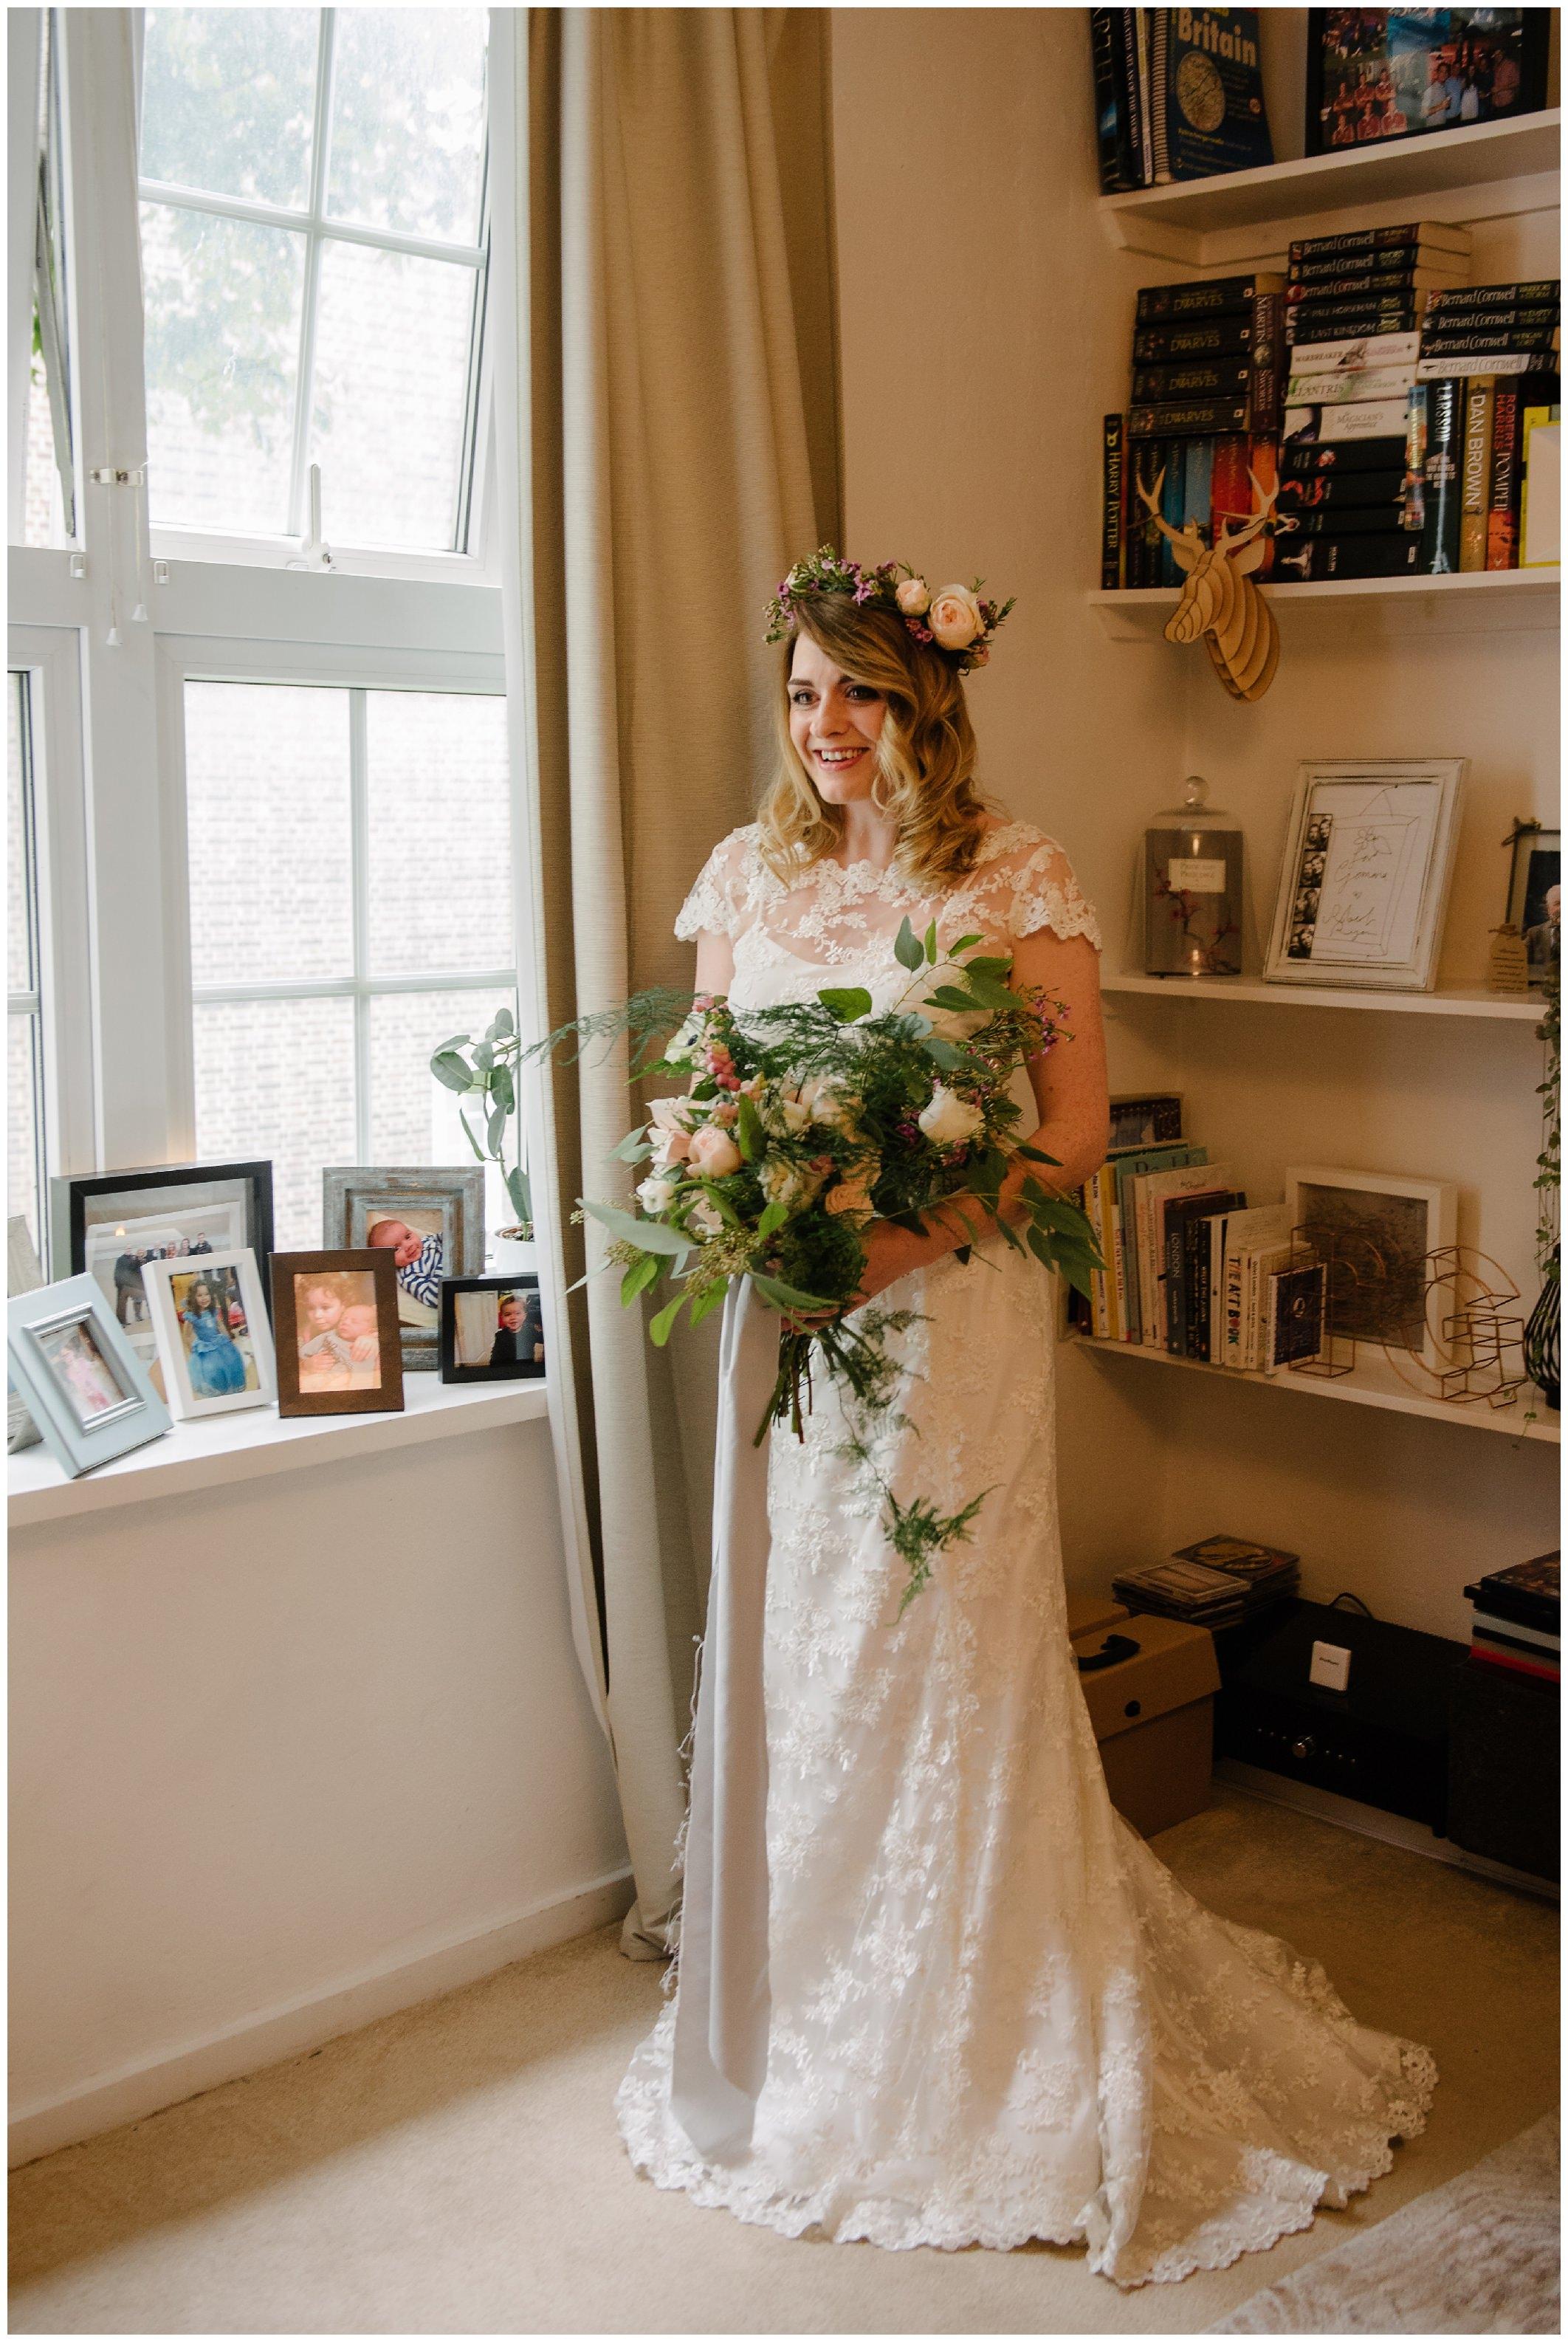 asylum_chapel_peckham_rosendale_wedding_jude_browne_photography_0021.jpg